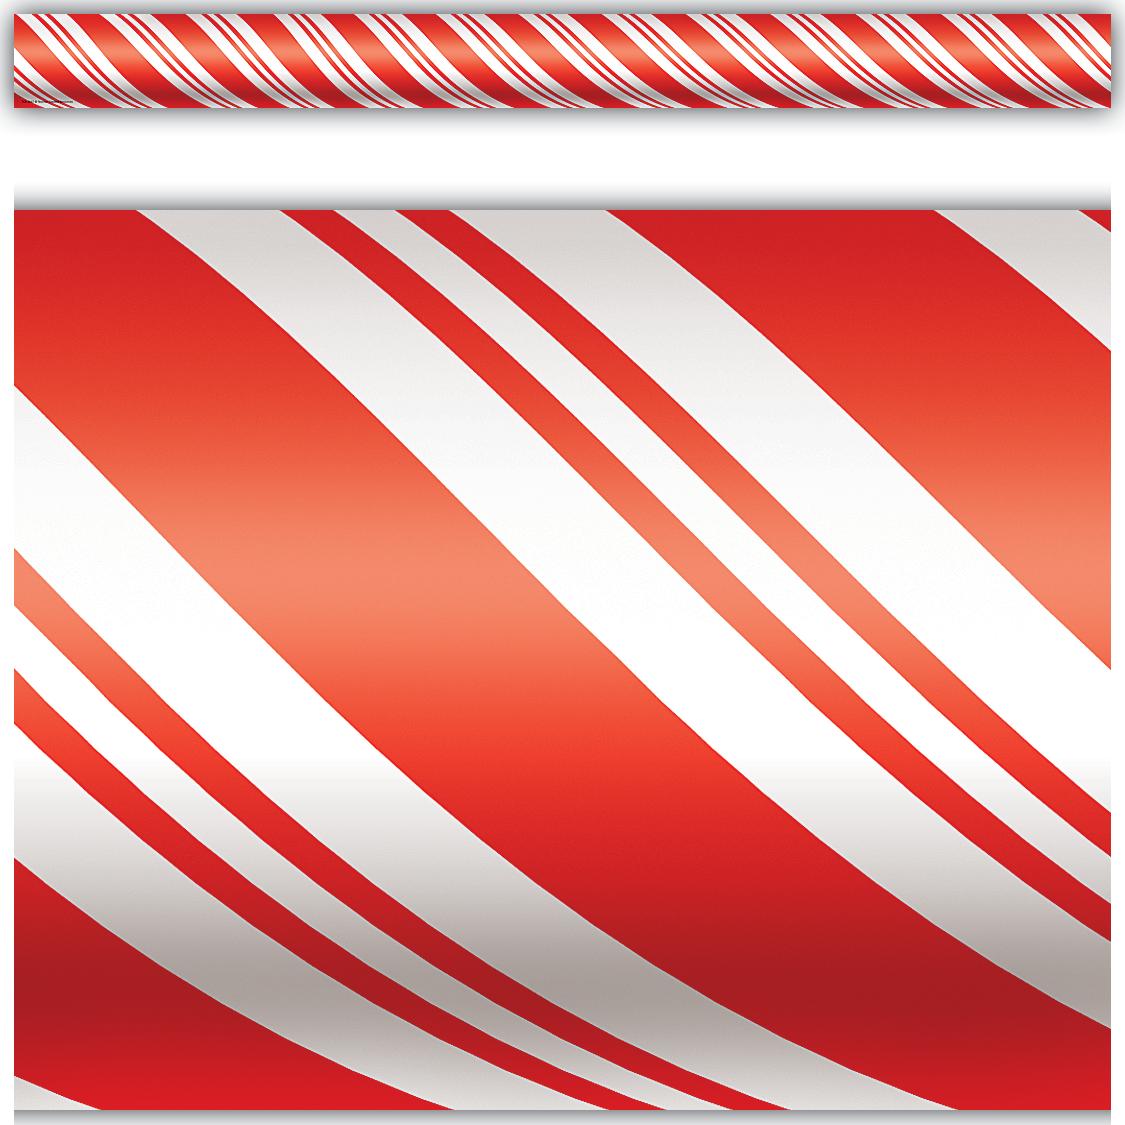 Candy Cane Straight Border Trim Tcr4667 Teacher